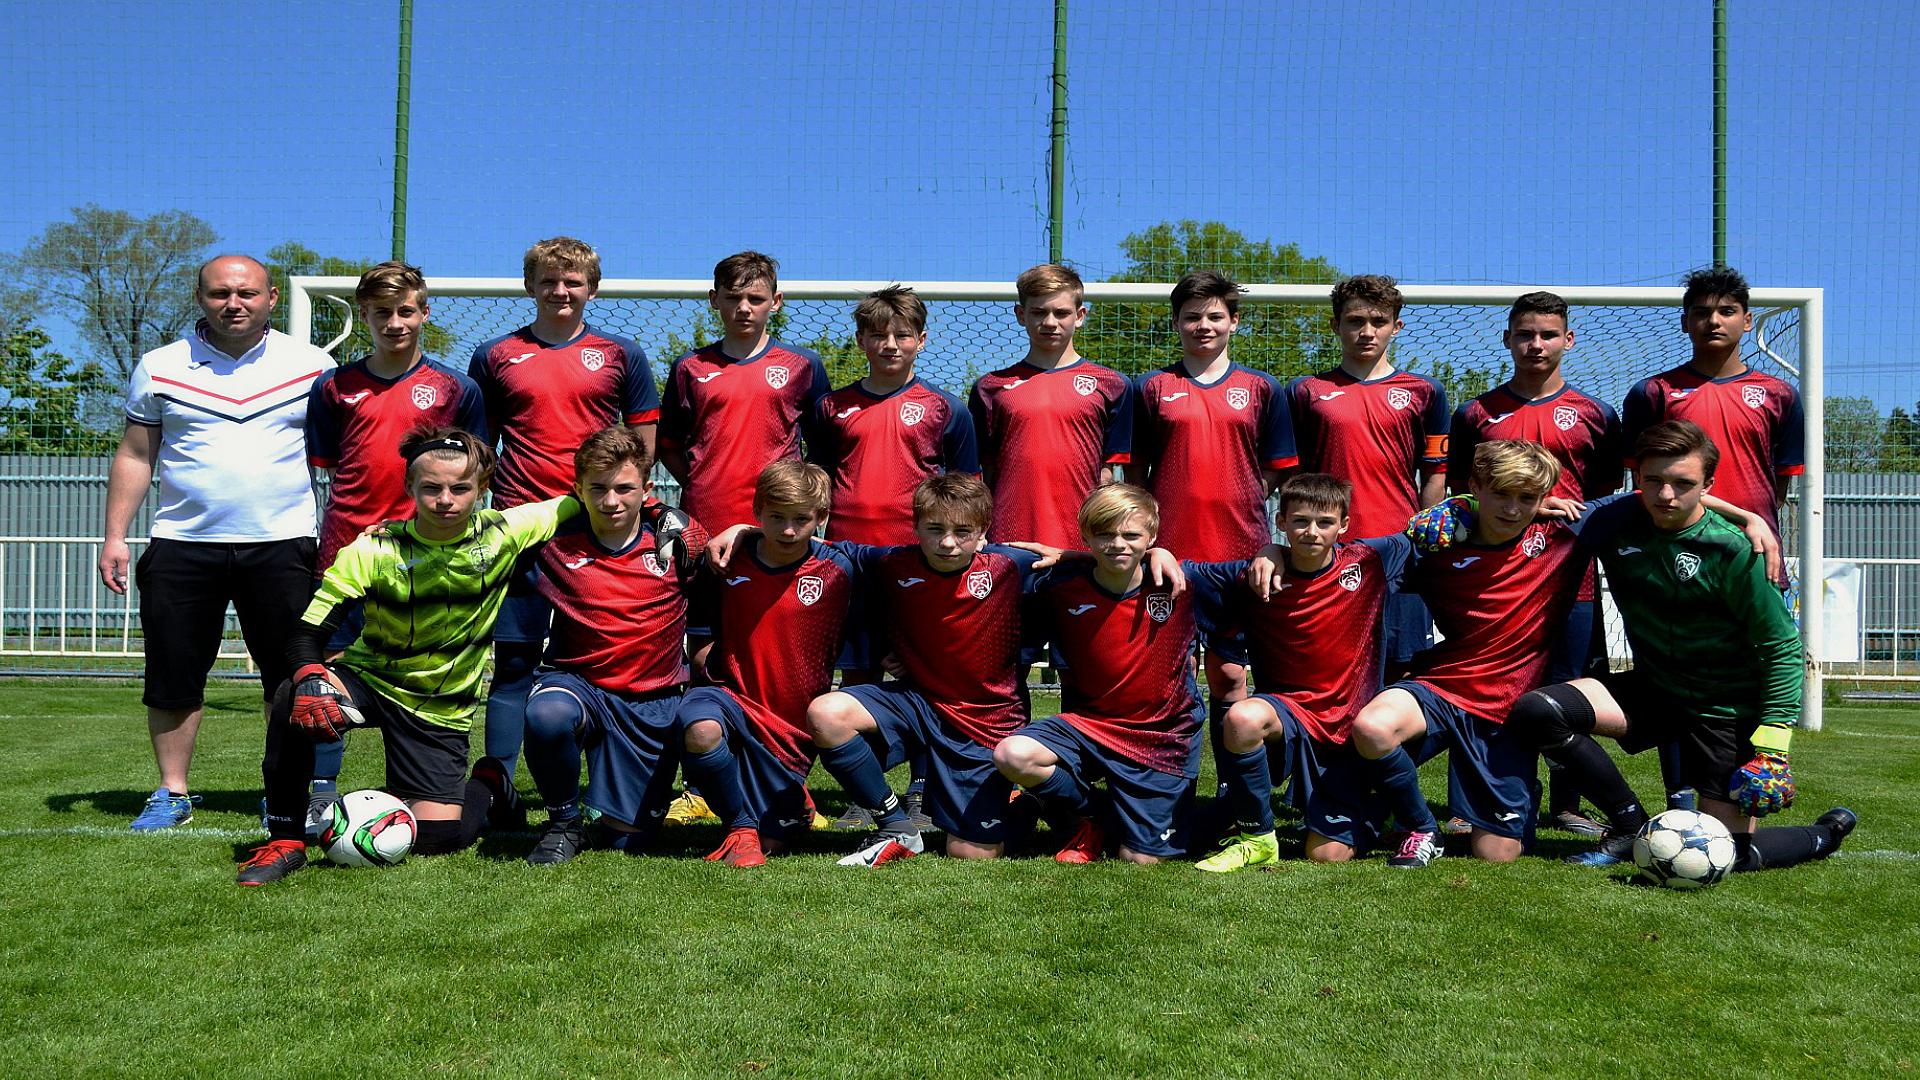 FK NJ - Foto Krnov MU st.žáci U14/U15 18.5.2019